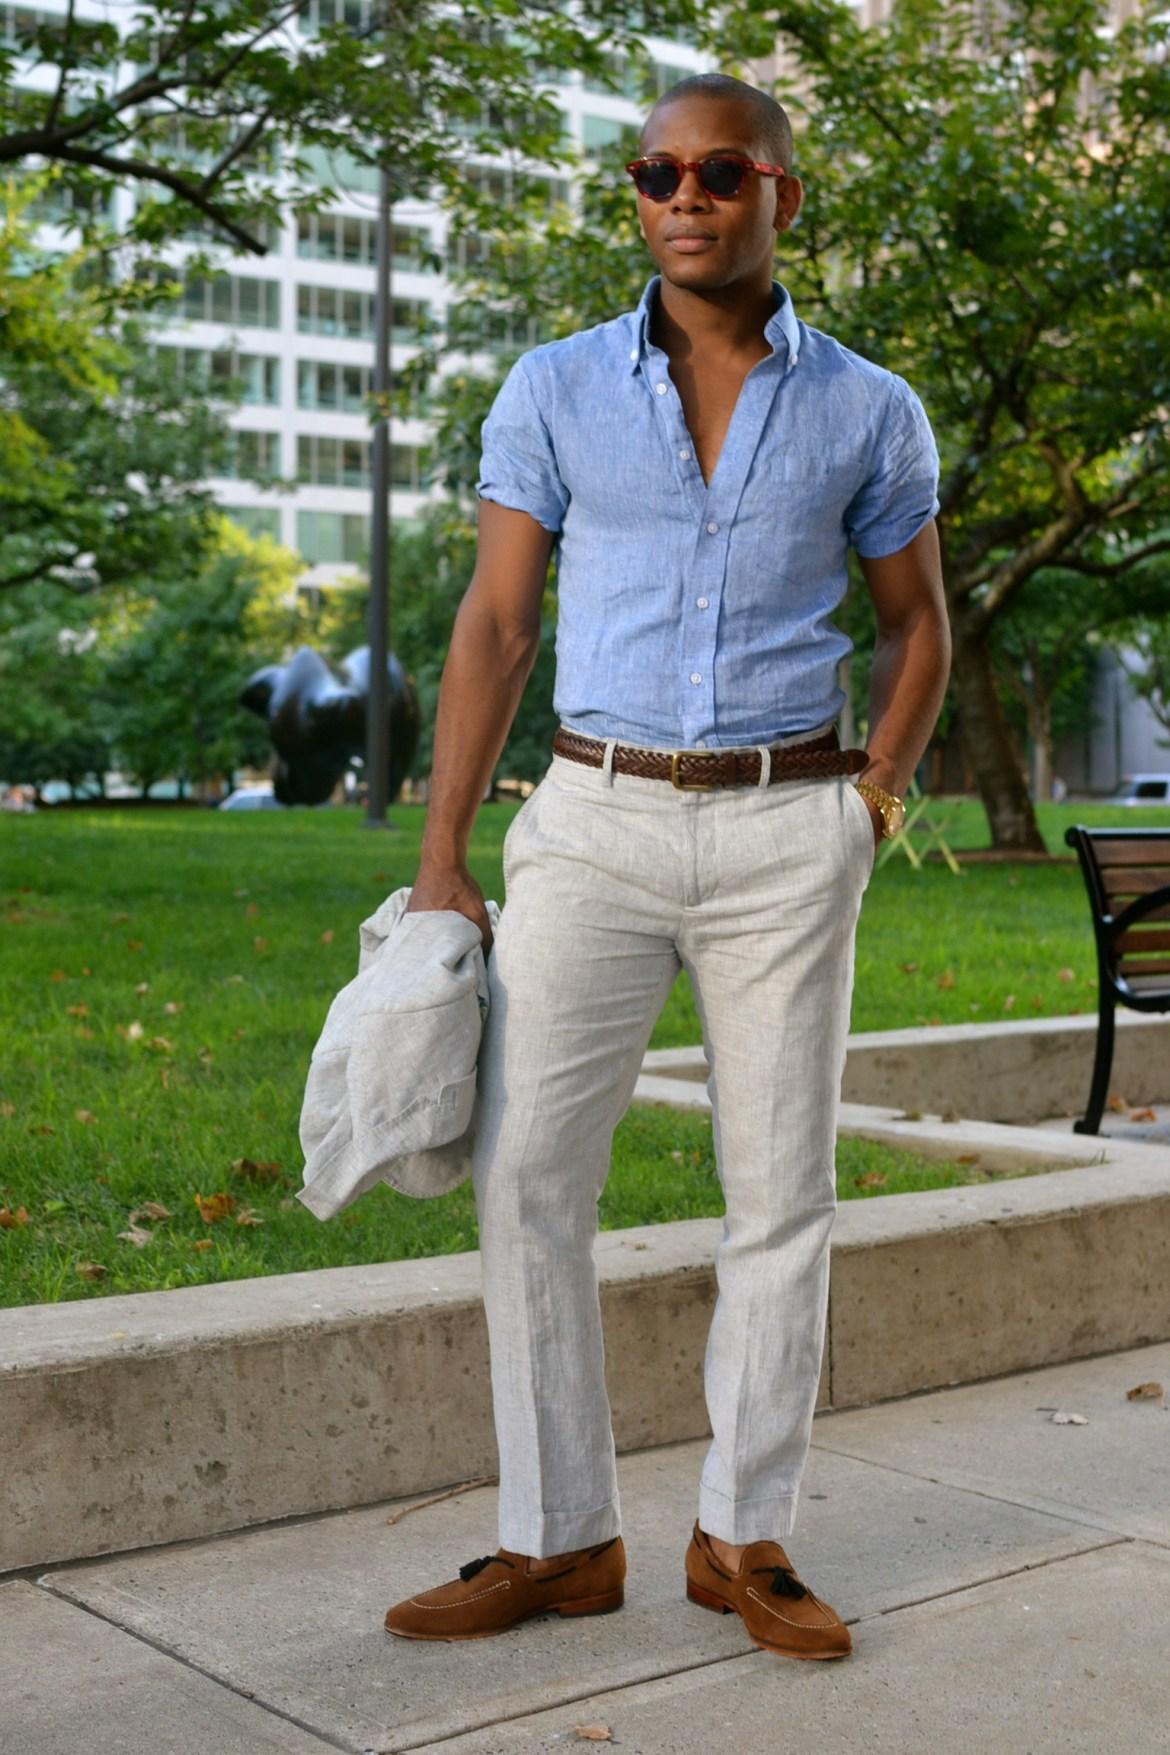 JJ threads custom button down shirt - Men's Style Pro